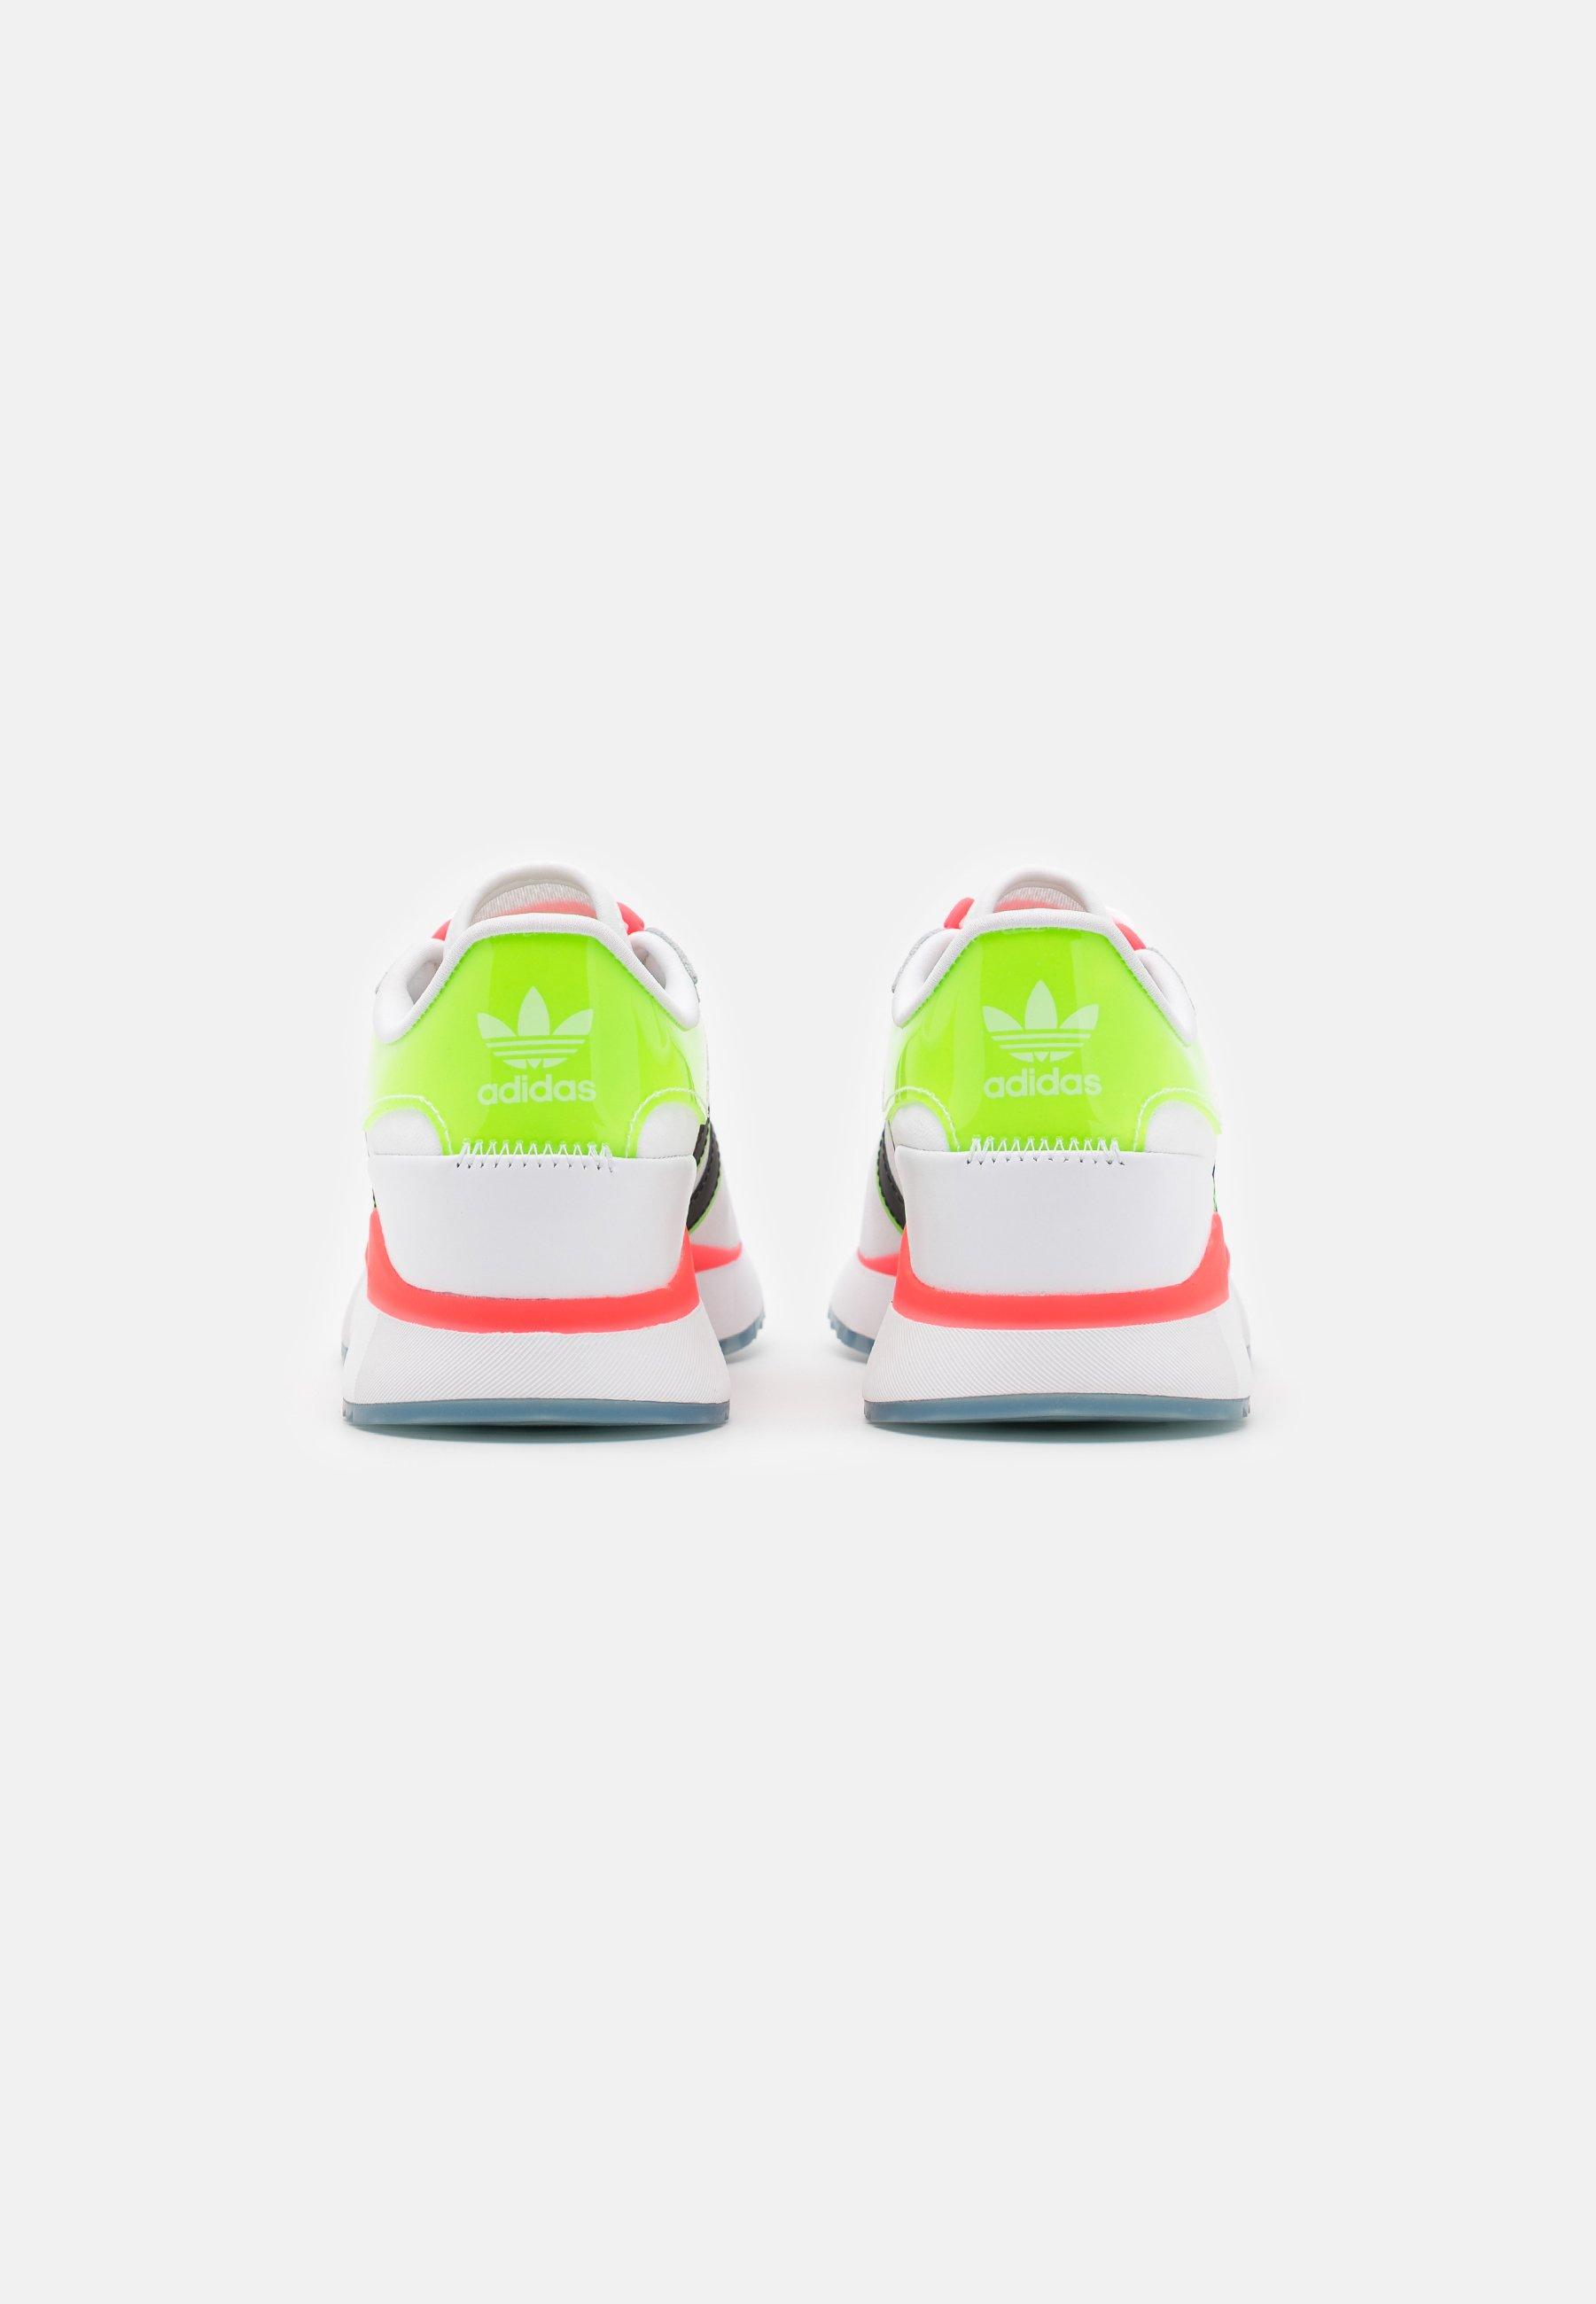 Adidas Originals Andridge Sports Inspired Shoes - Sneakers Footwear White/core Black/signal Pink